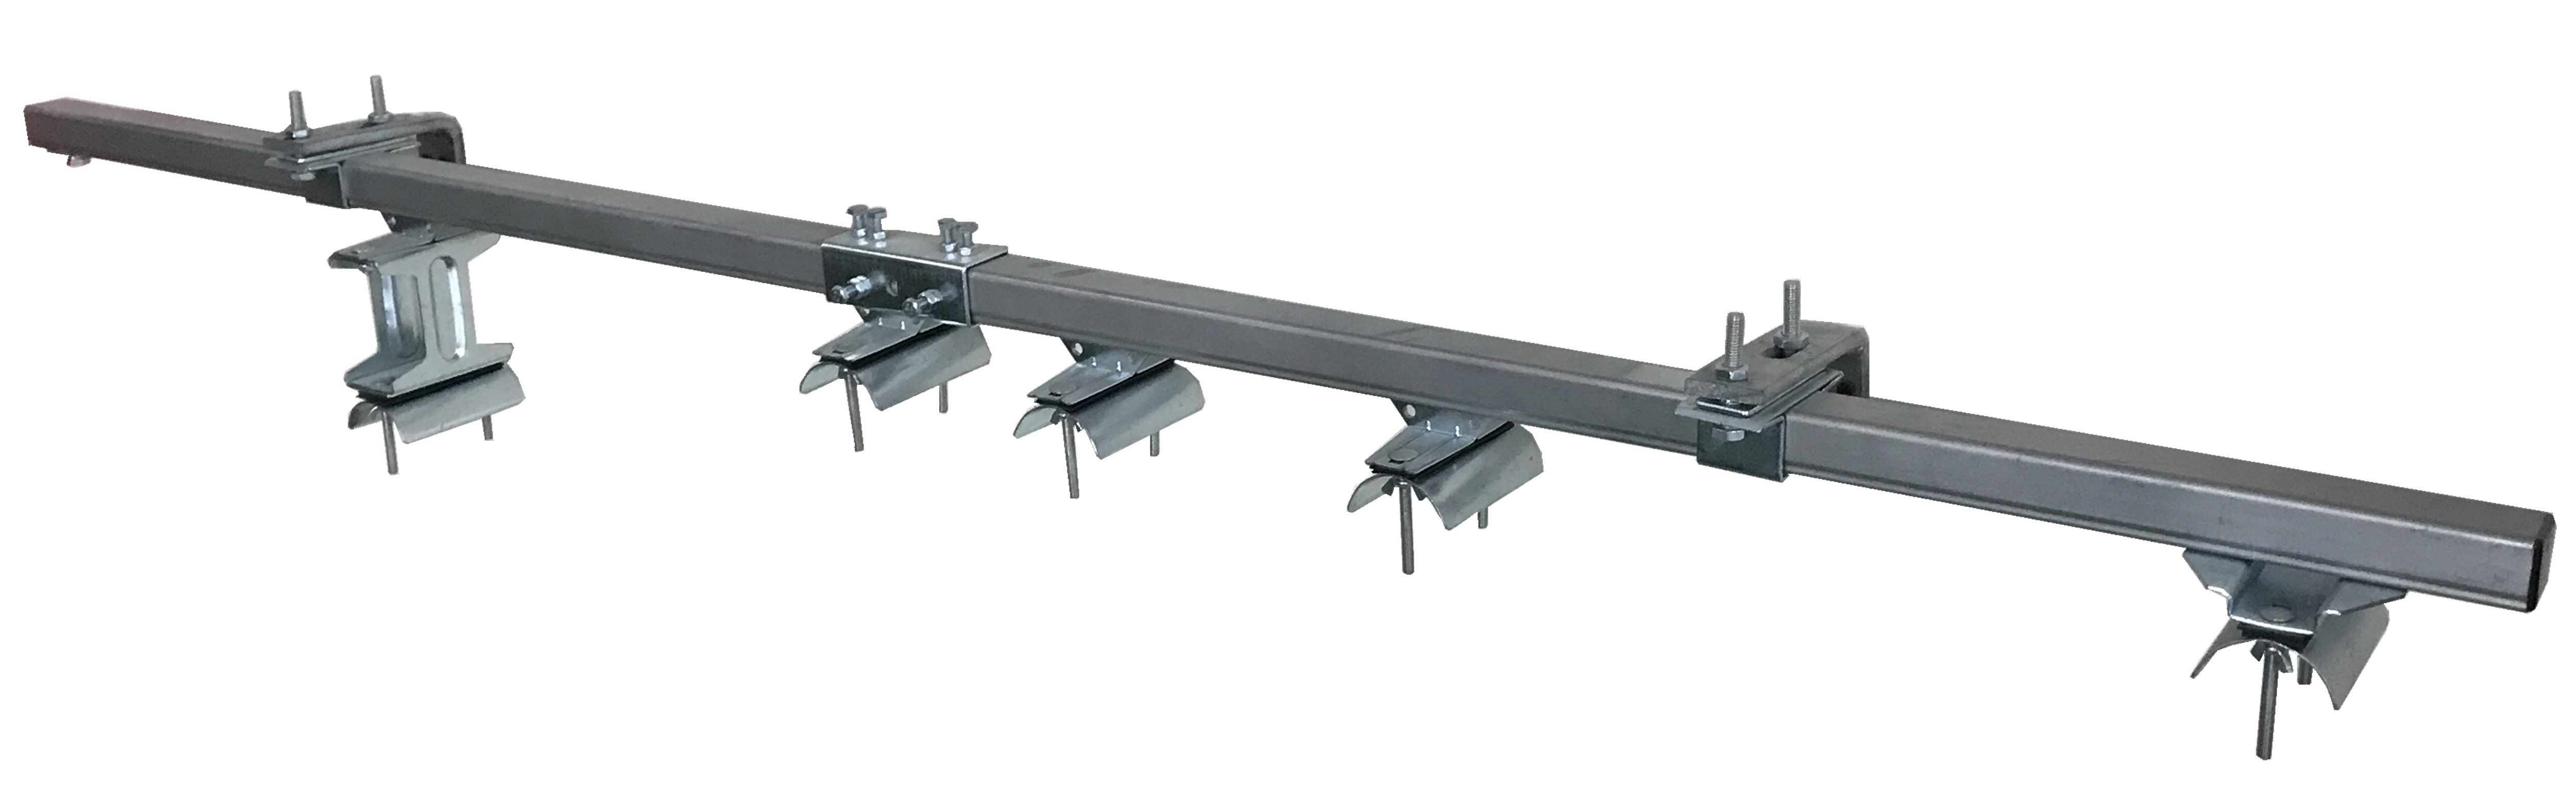 C - Track Festoon System